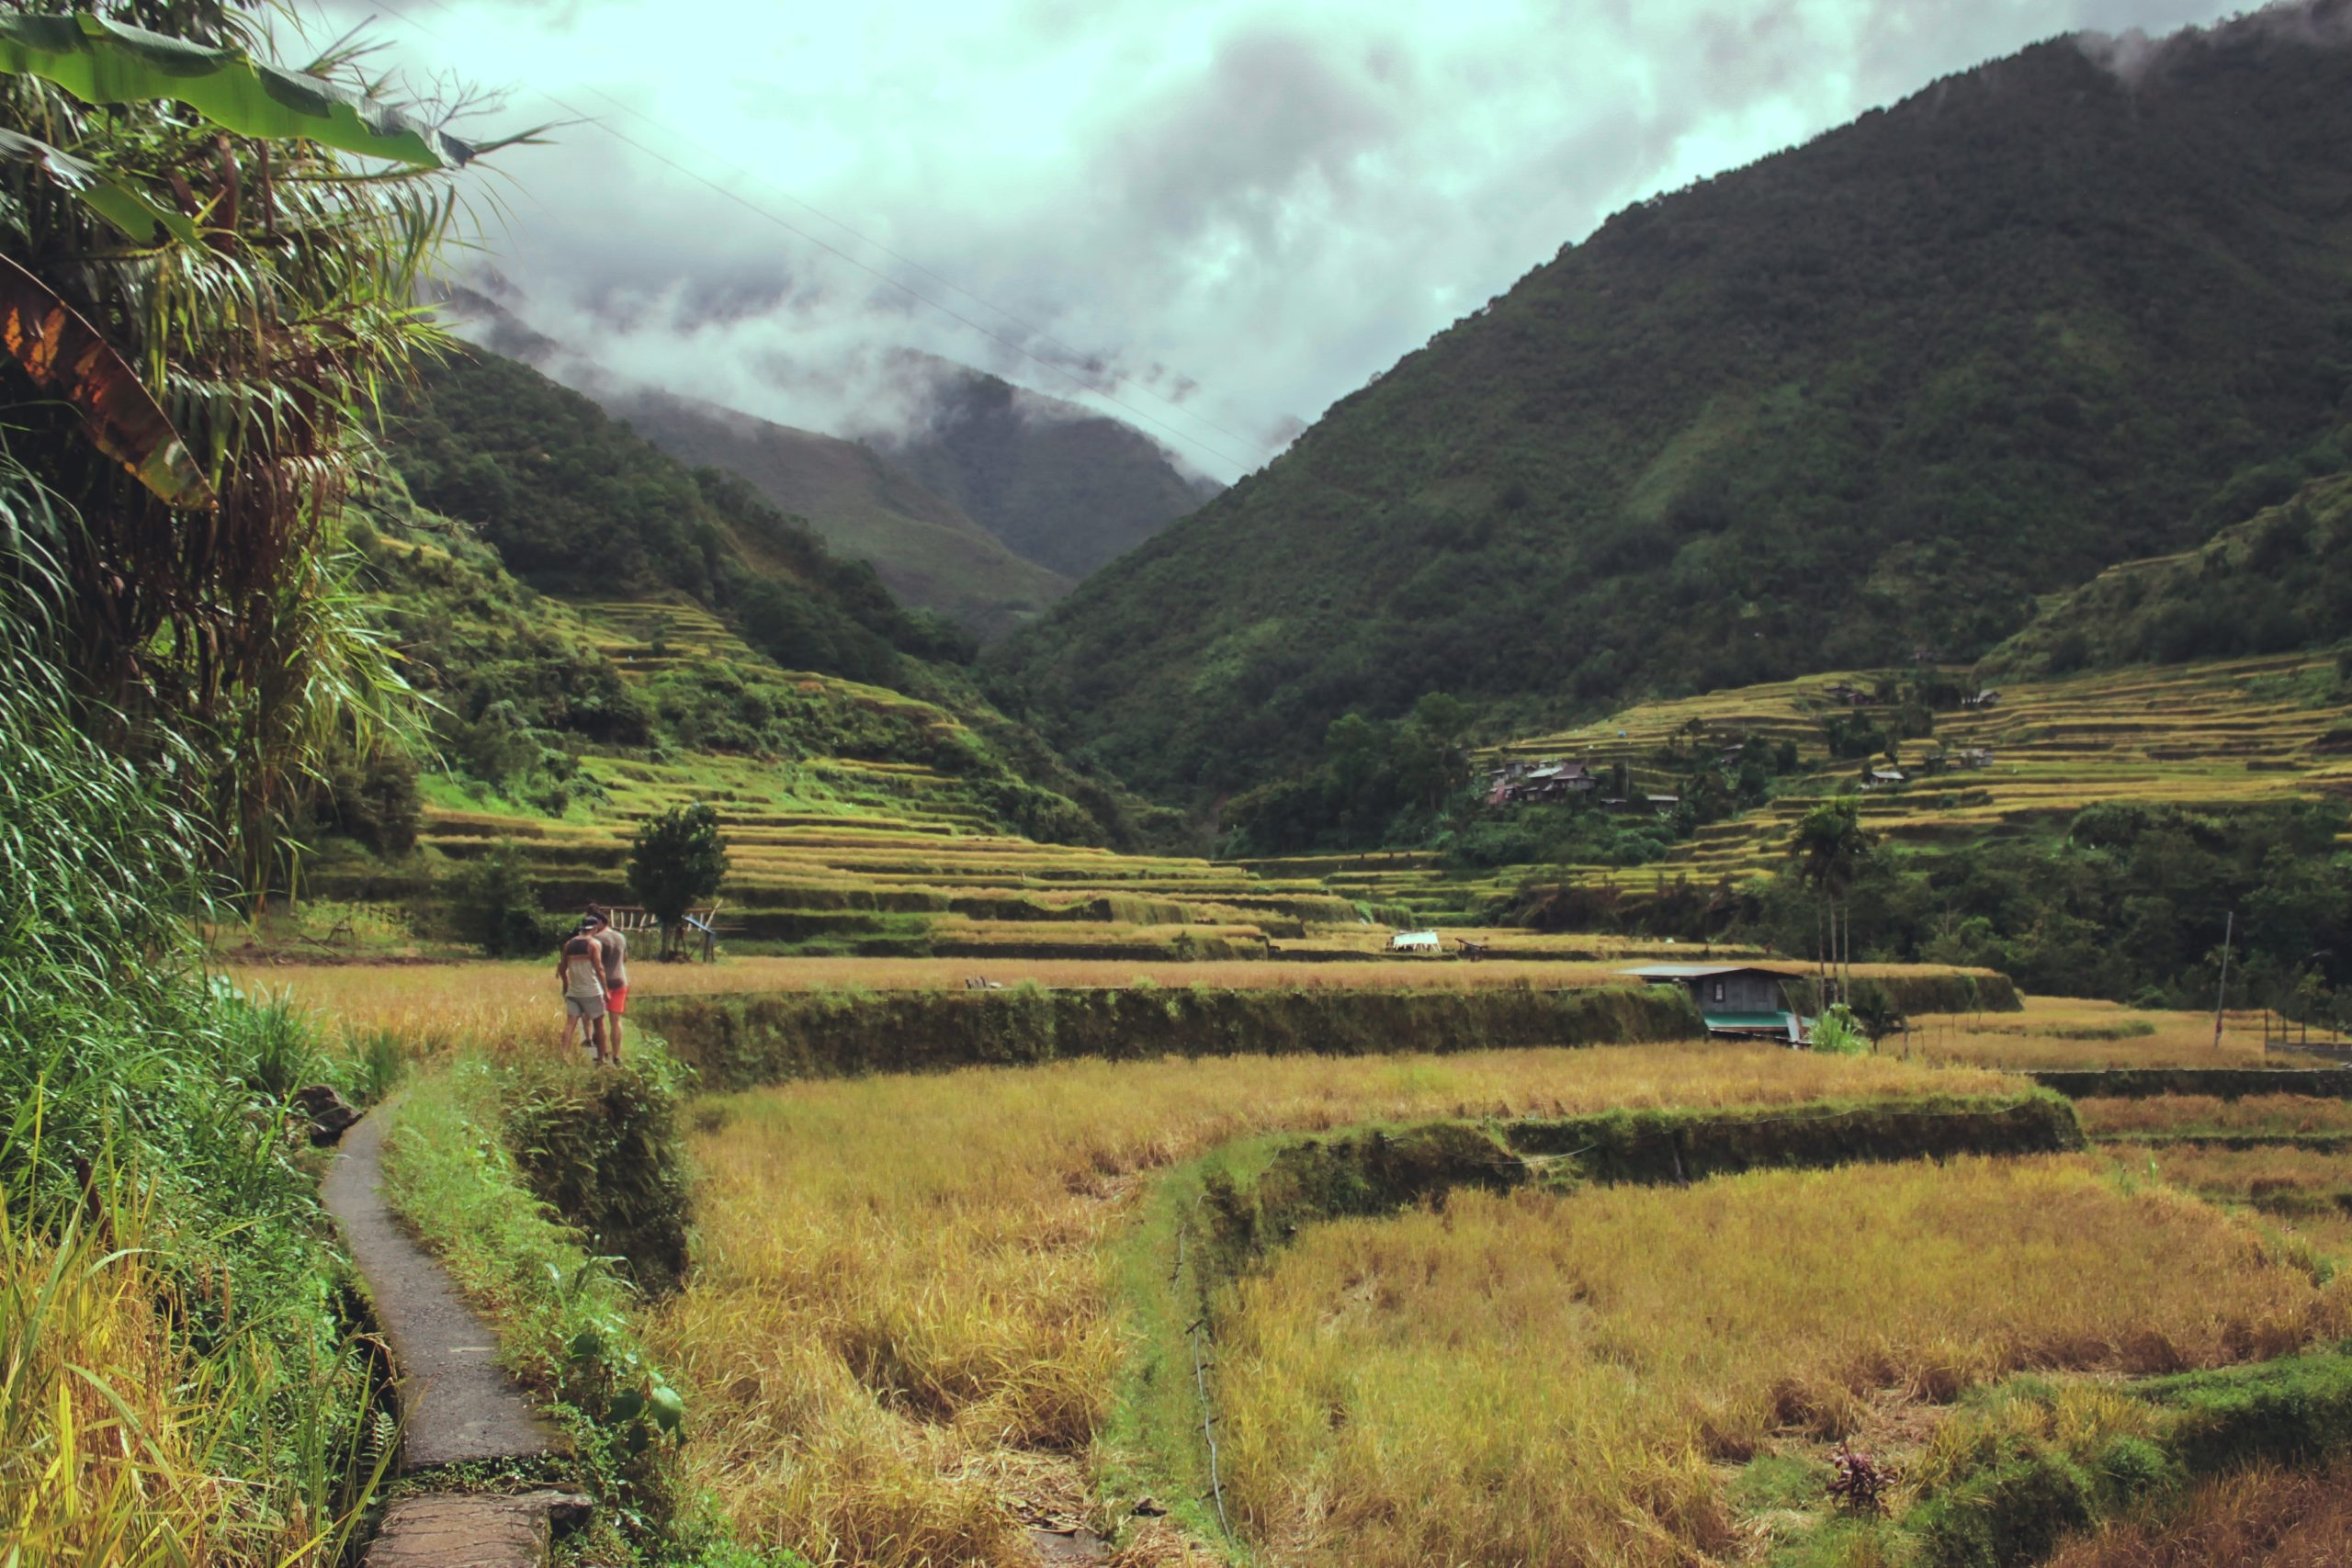 DIY Travel Guide to Batad, Ifugao, Philippines